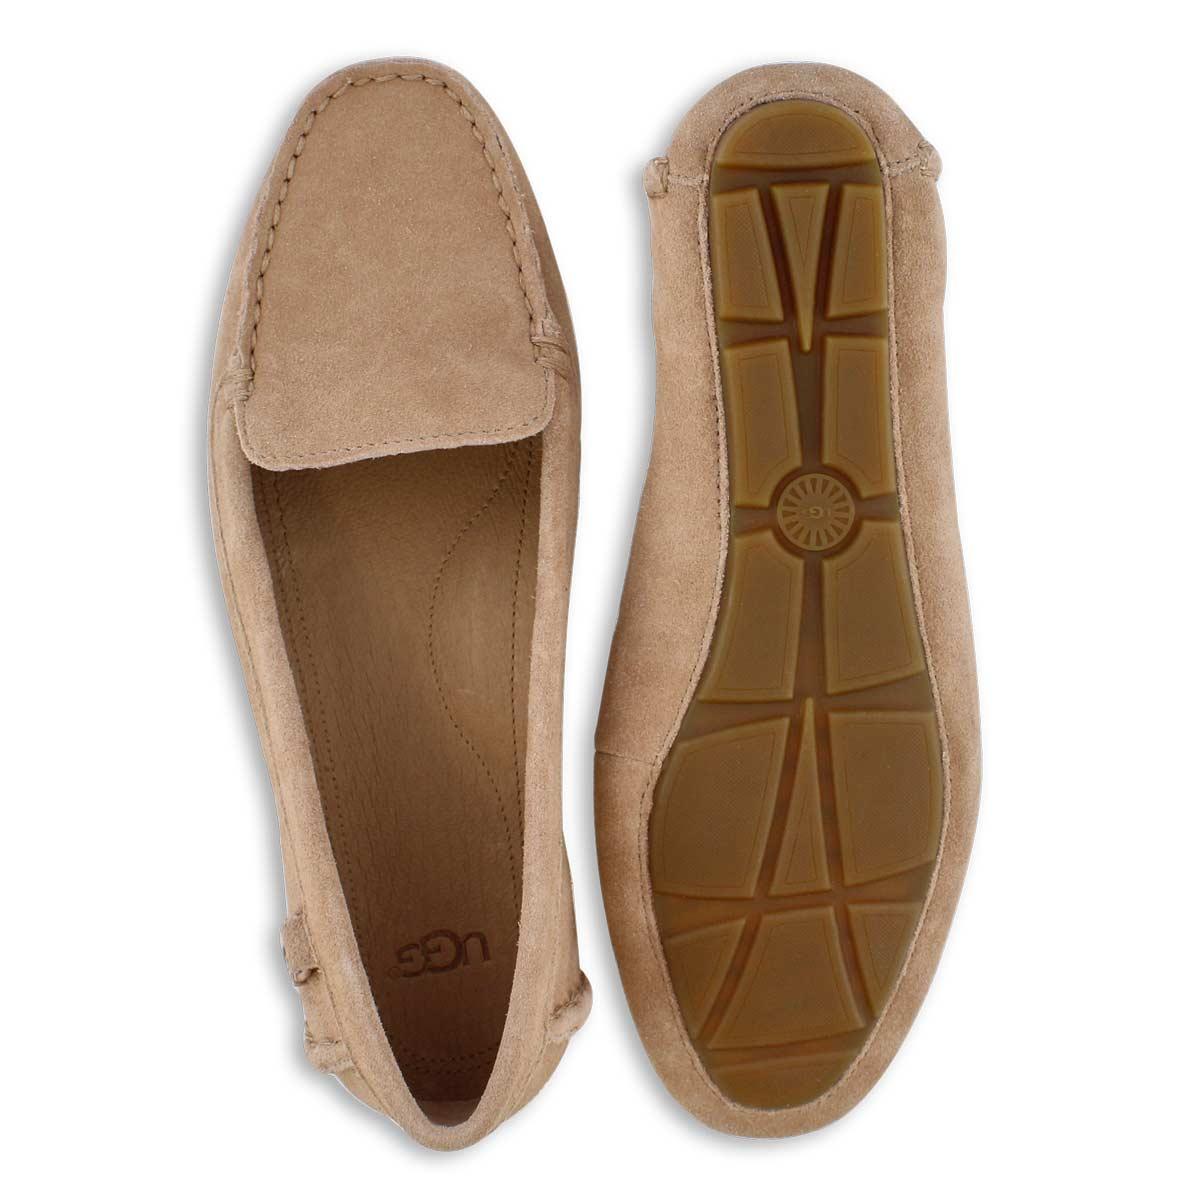 Lds Flores arroyo casual slip on shoe